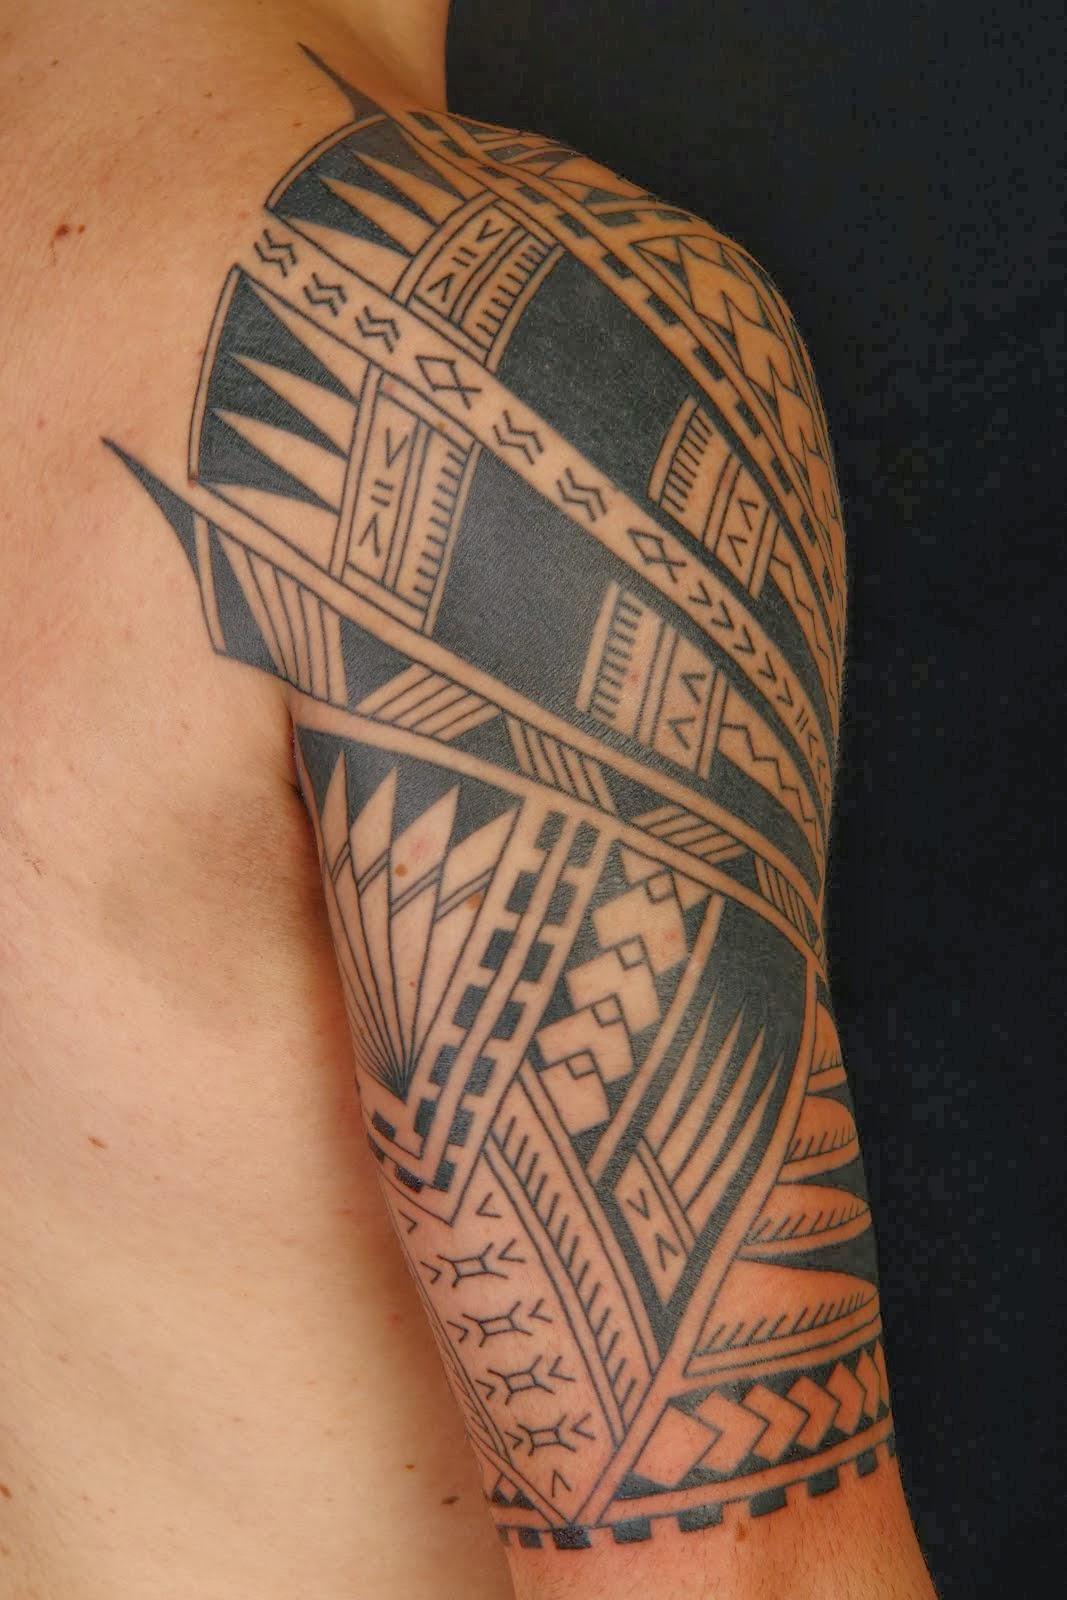 Maori Lower Arm Band Tattoo: 30+ Maori Arm Tattoos Collection